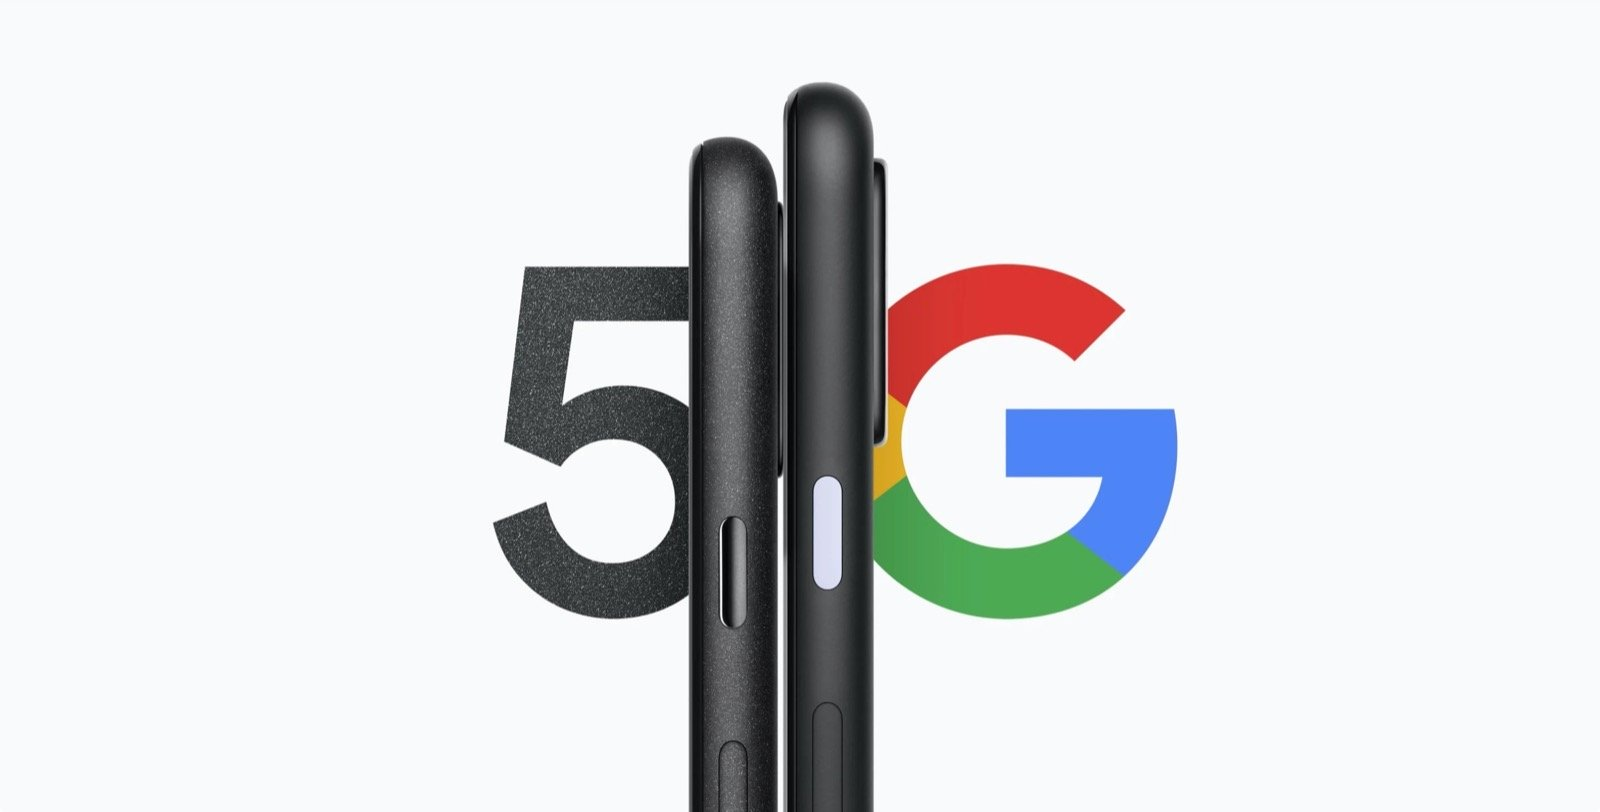 Pixel 5/Pixel 4a (5G)、販売日は10月8日か。Google公式ブログで誤掲載